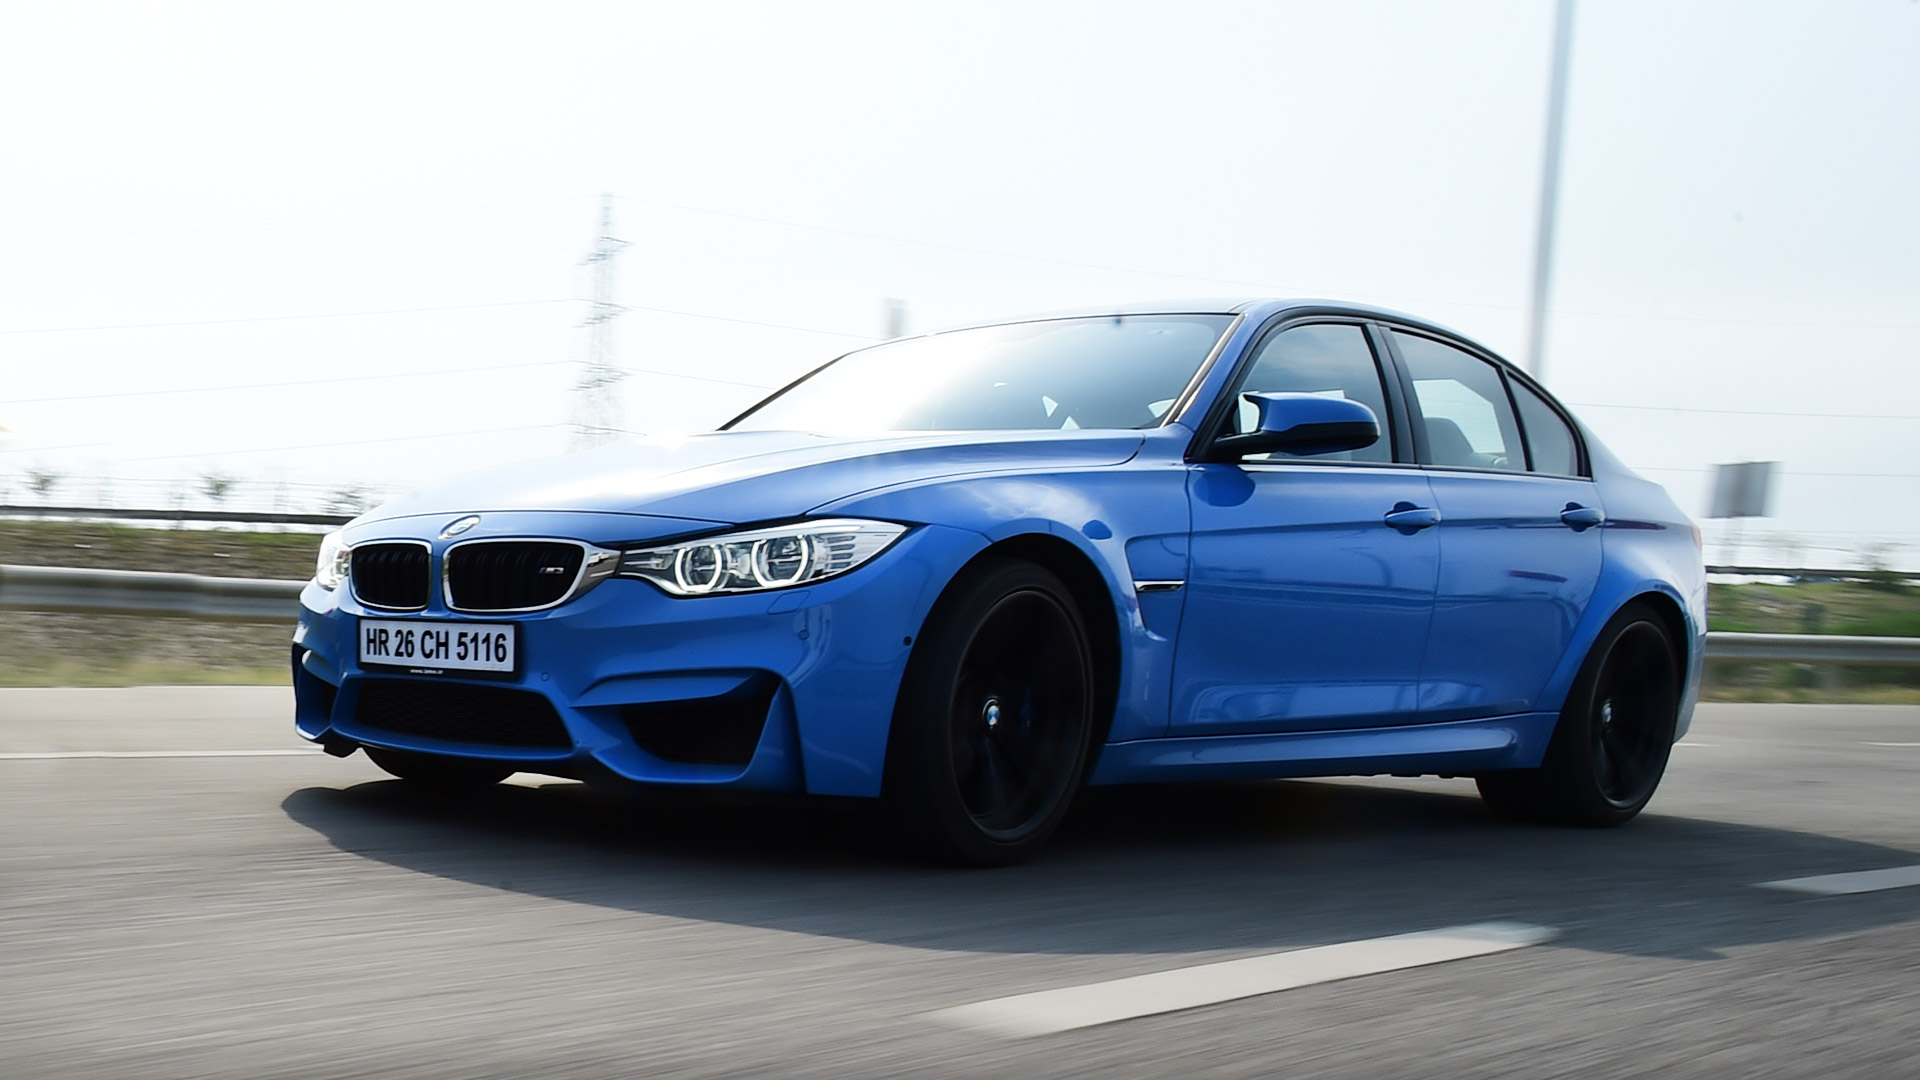 BMW M3 sedan 2018 Price Mileage Reviews Specification Gallery